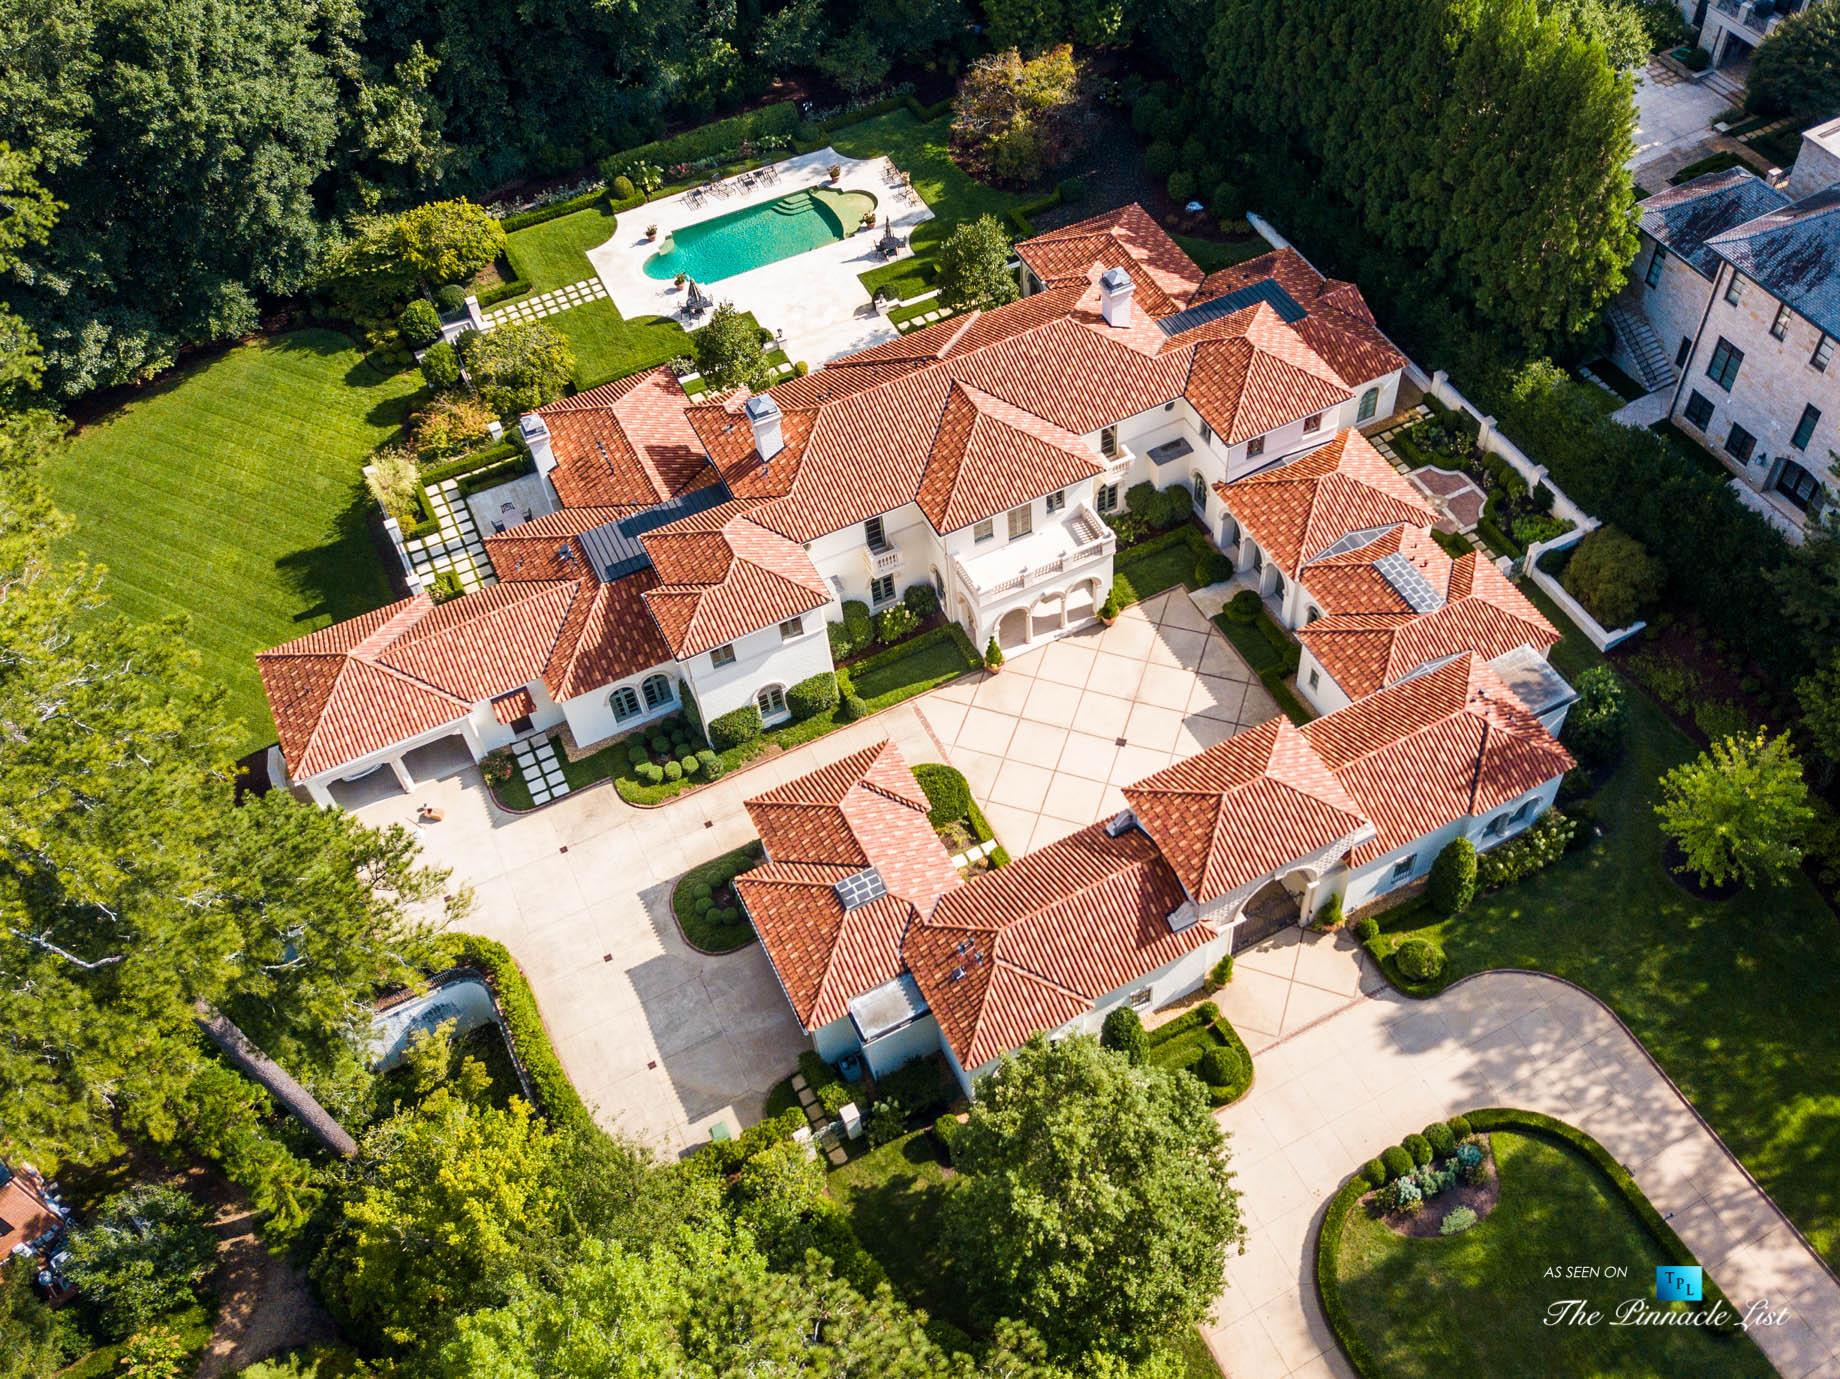 439 Blackland Rd NW, Atlanta, GA, USA – Drone Aerial Property View – Luxury Real Estate – Tuxedo Park Mediterranean Mansion Home